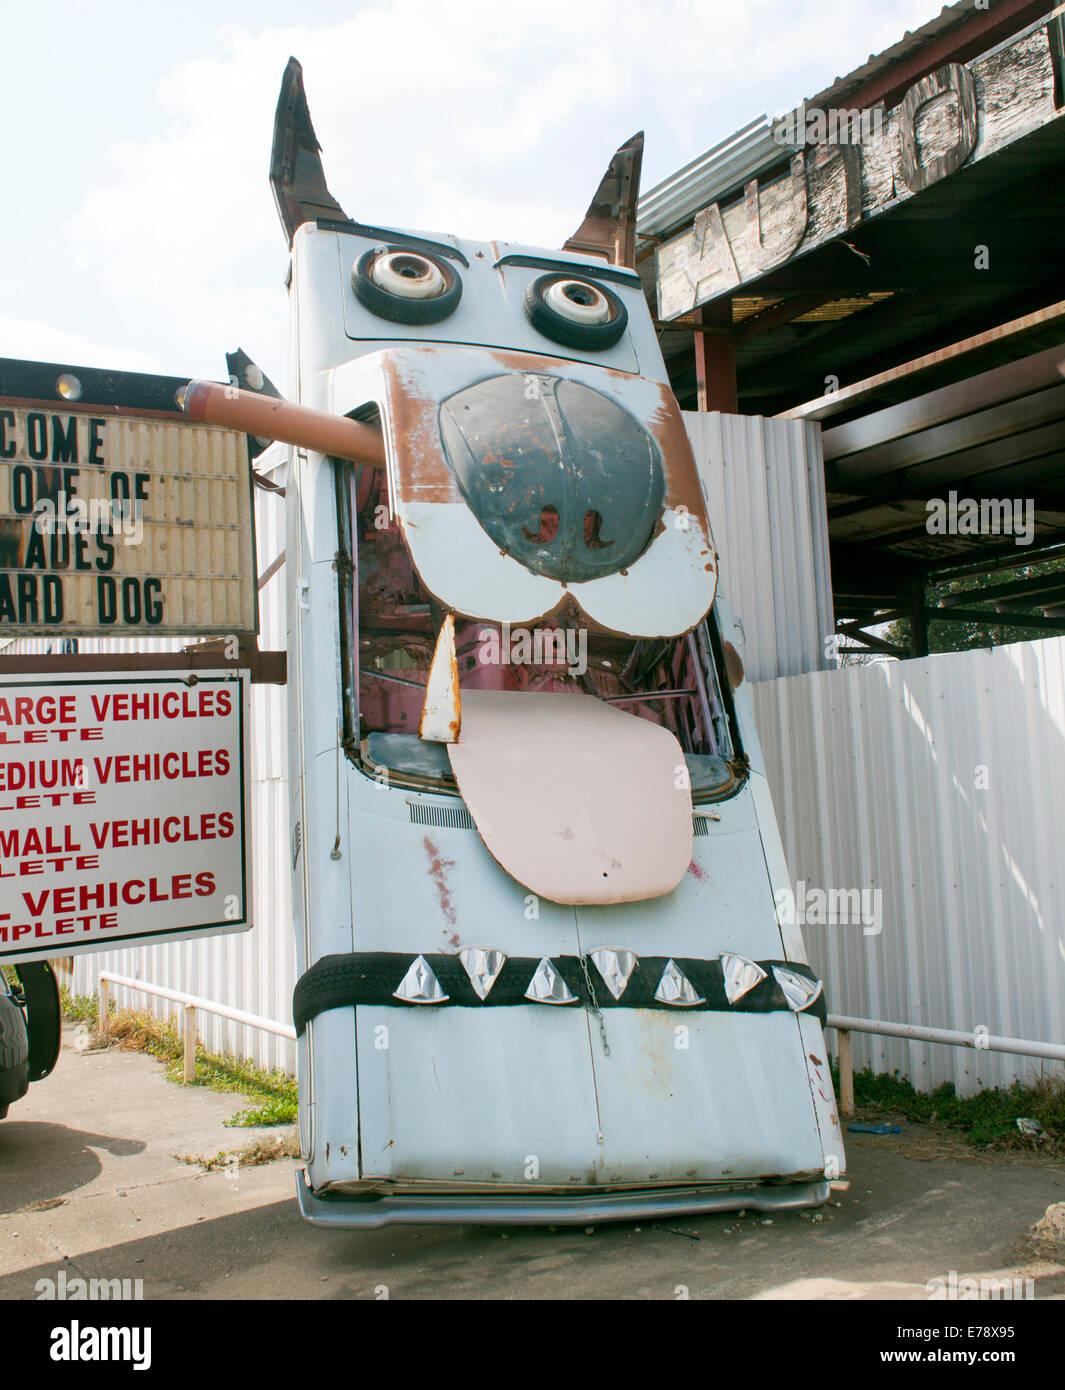 Dog car sculpture at a garage in San Antonio Texas - Stock Image